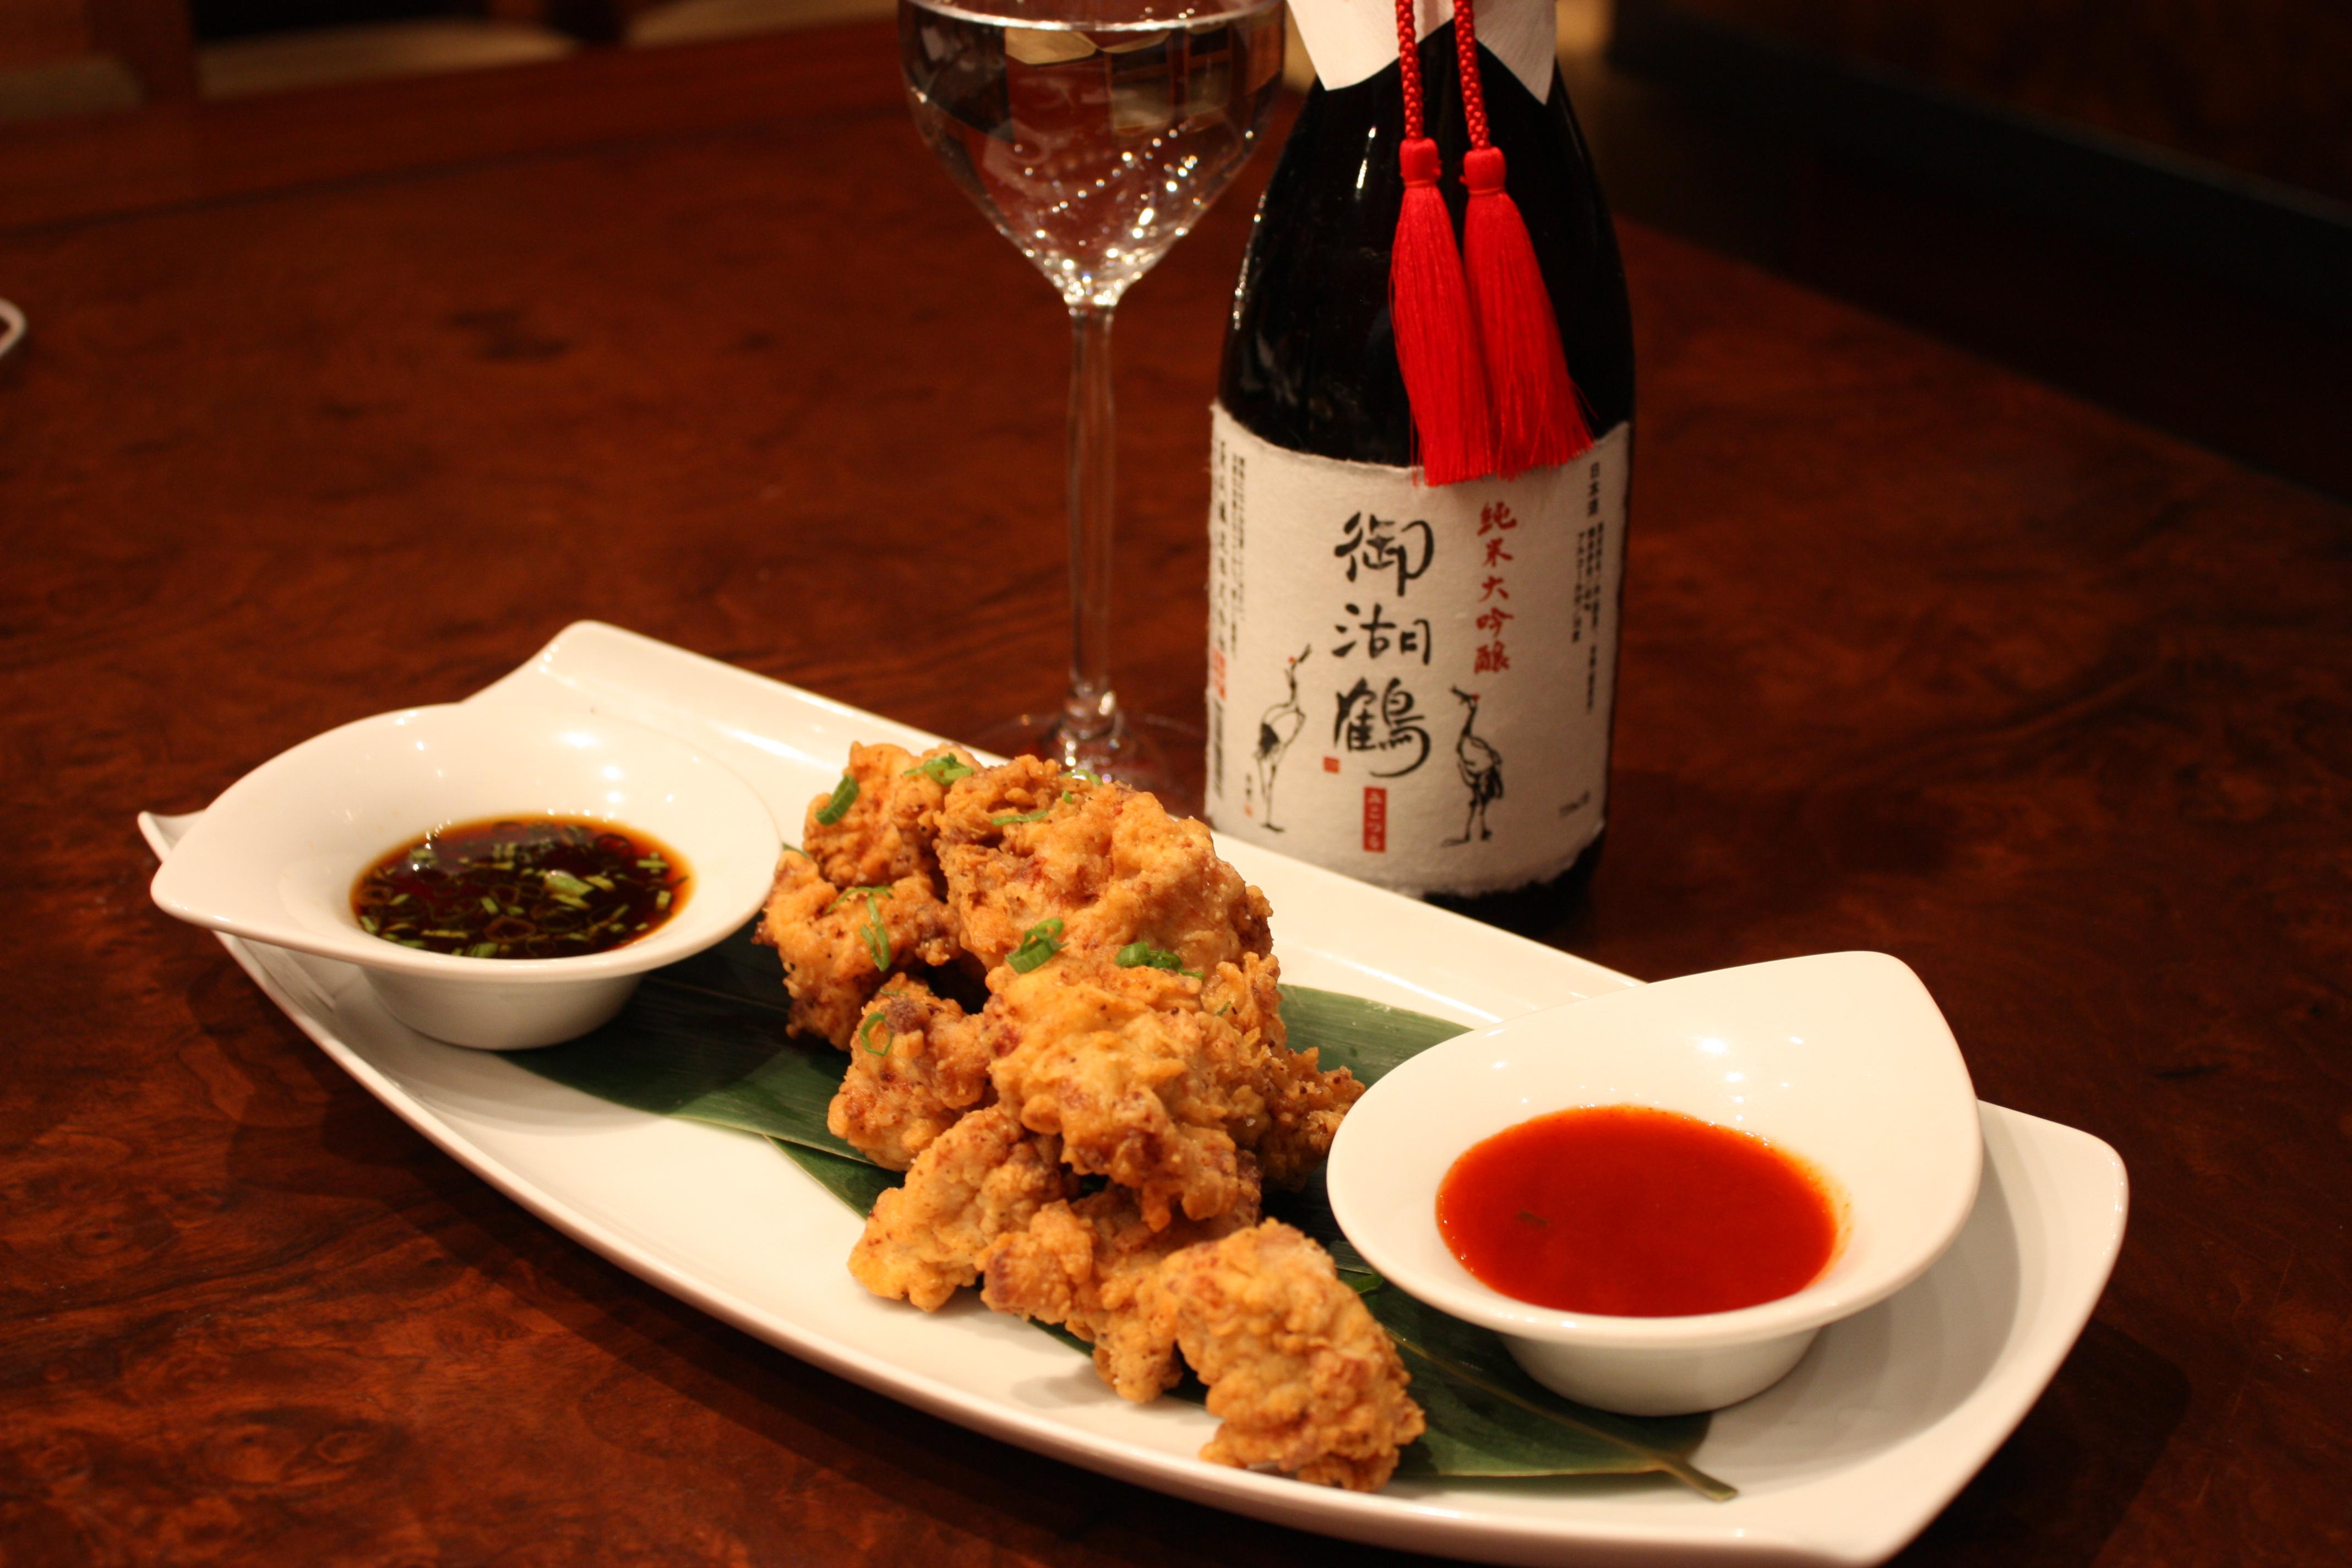 Image: K.F.C. Karaage Fried Chicken